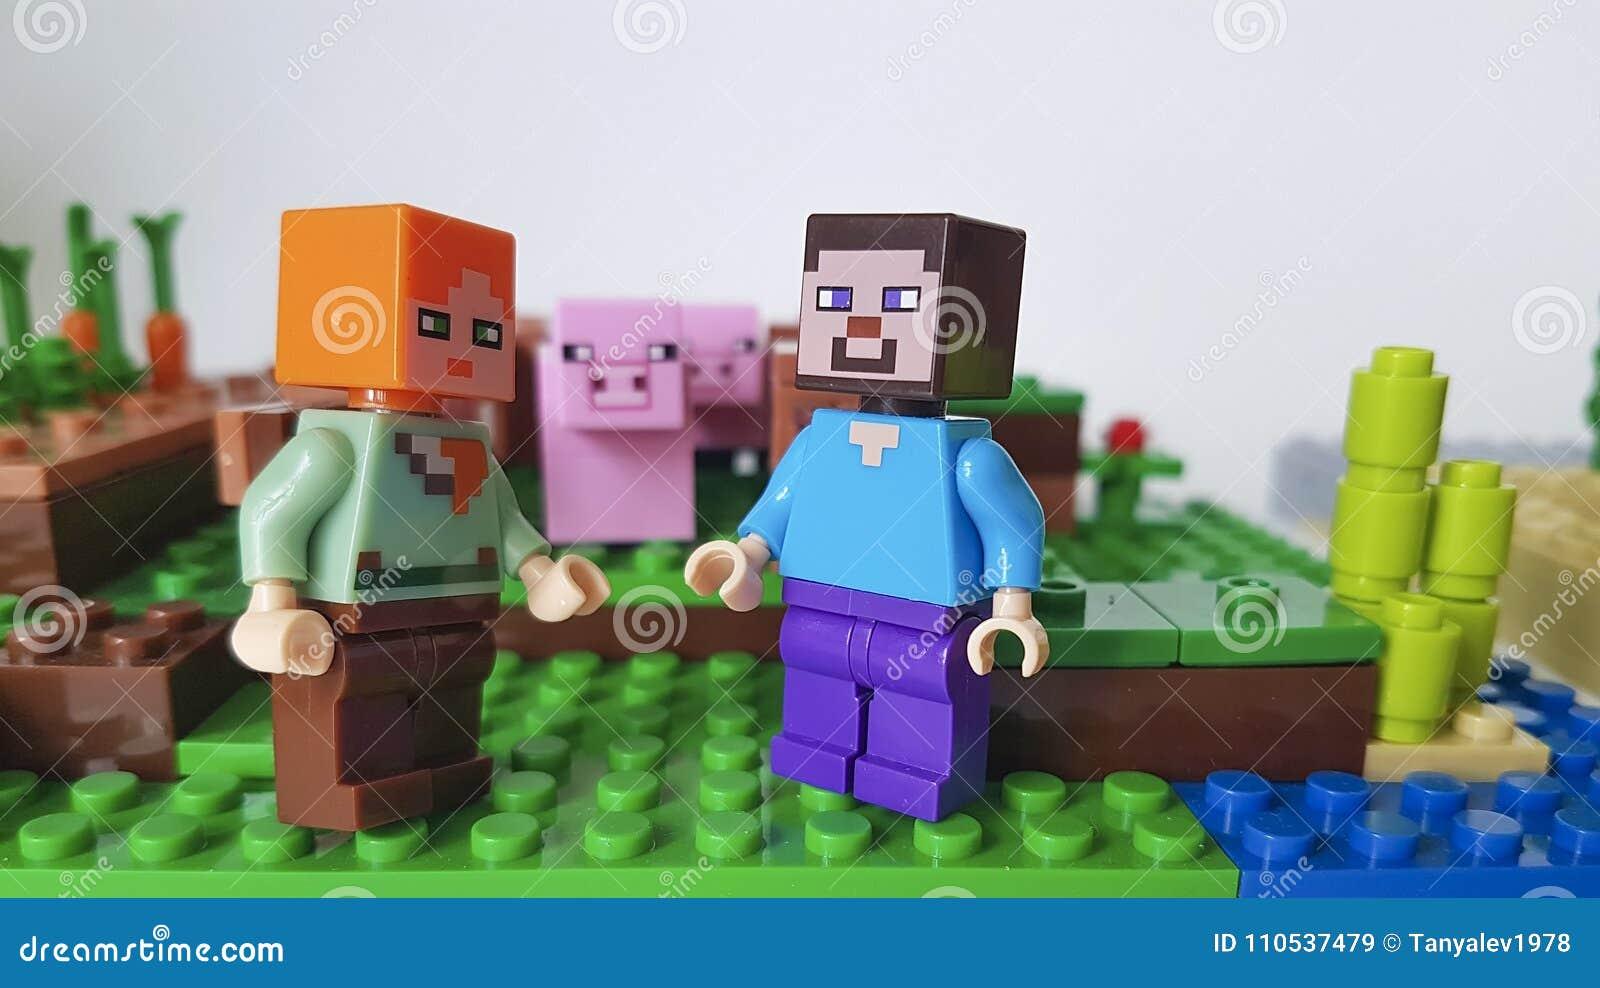 Ukraine Kiev February 21 2018 mini figure pig farm sword man plastic game popular childhood Lego Minecraft square